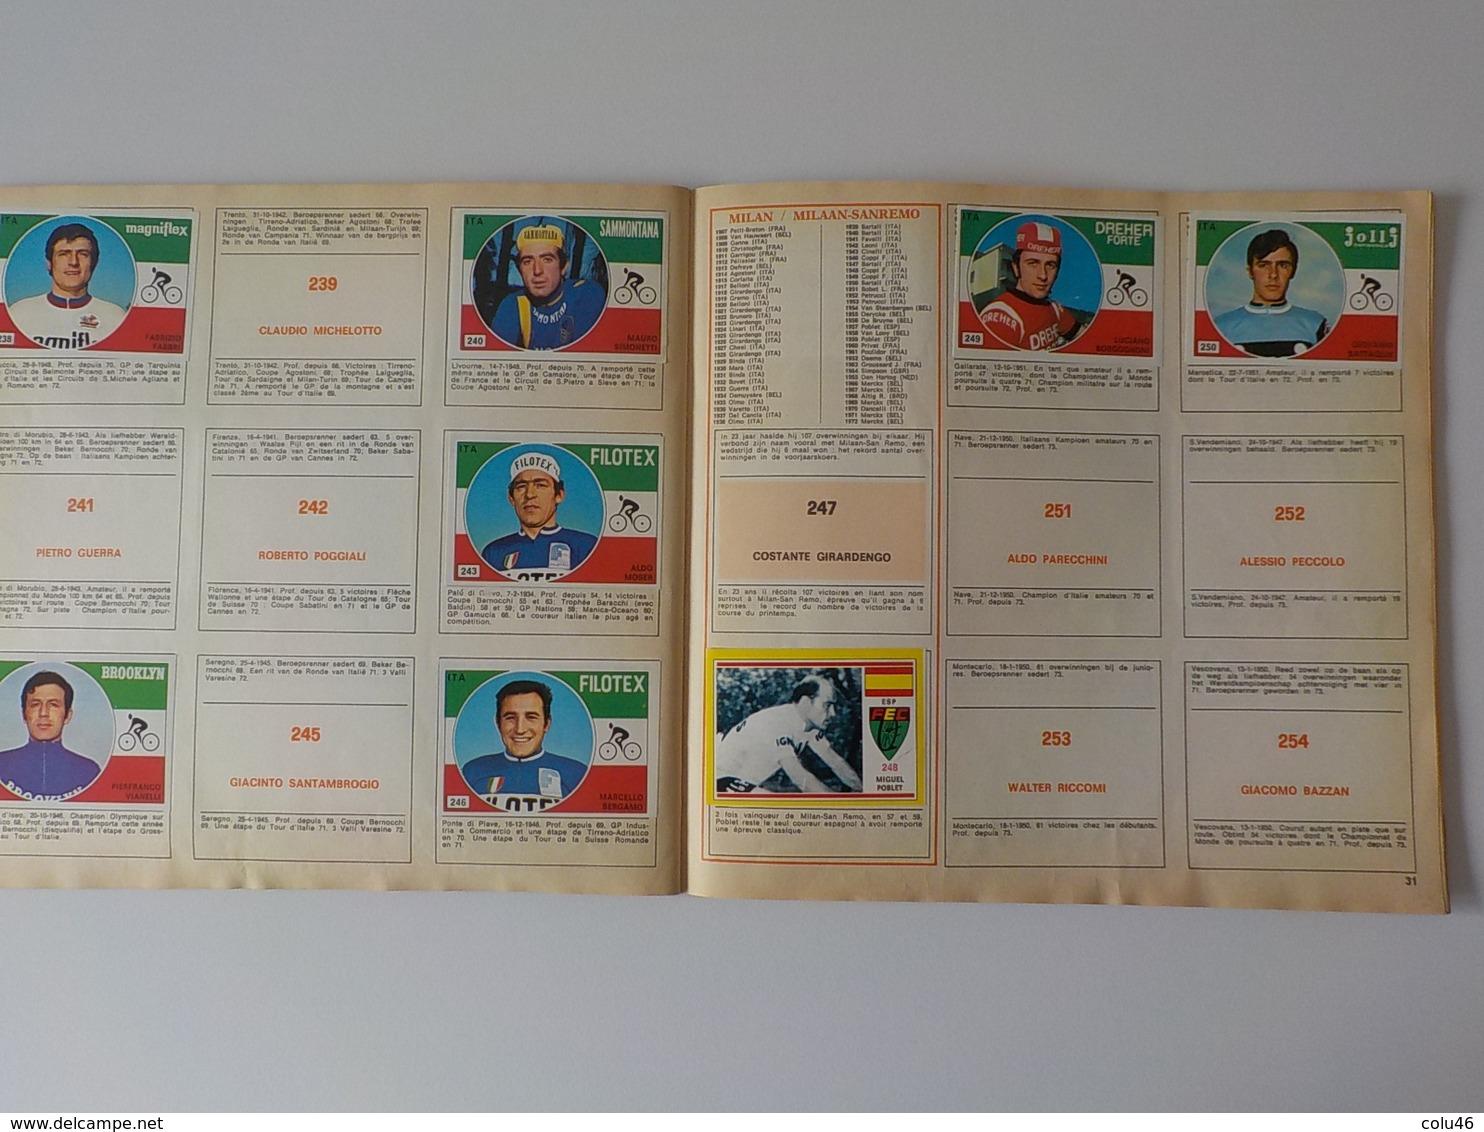 1973 Cyclisme Album Panini Sprint 73 Eddy Merckx Radfahren Wielrijder Chromos - Cyclisme